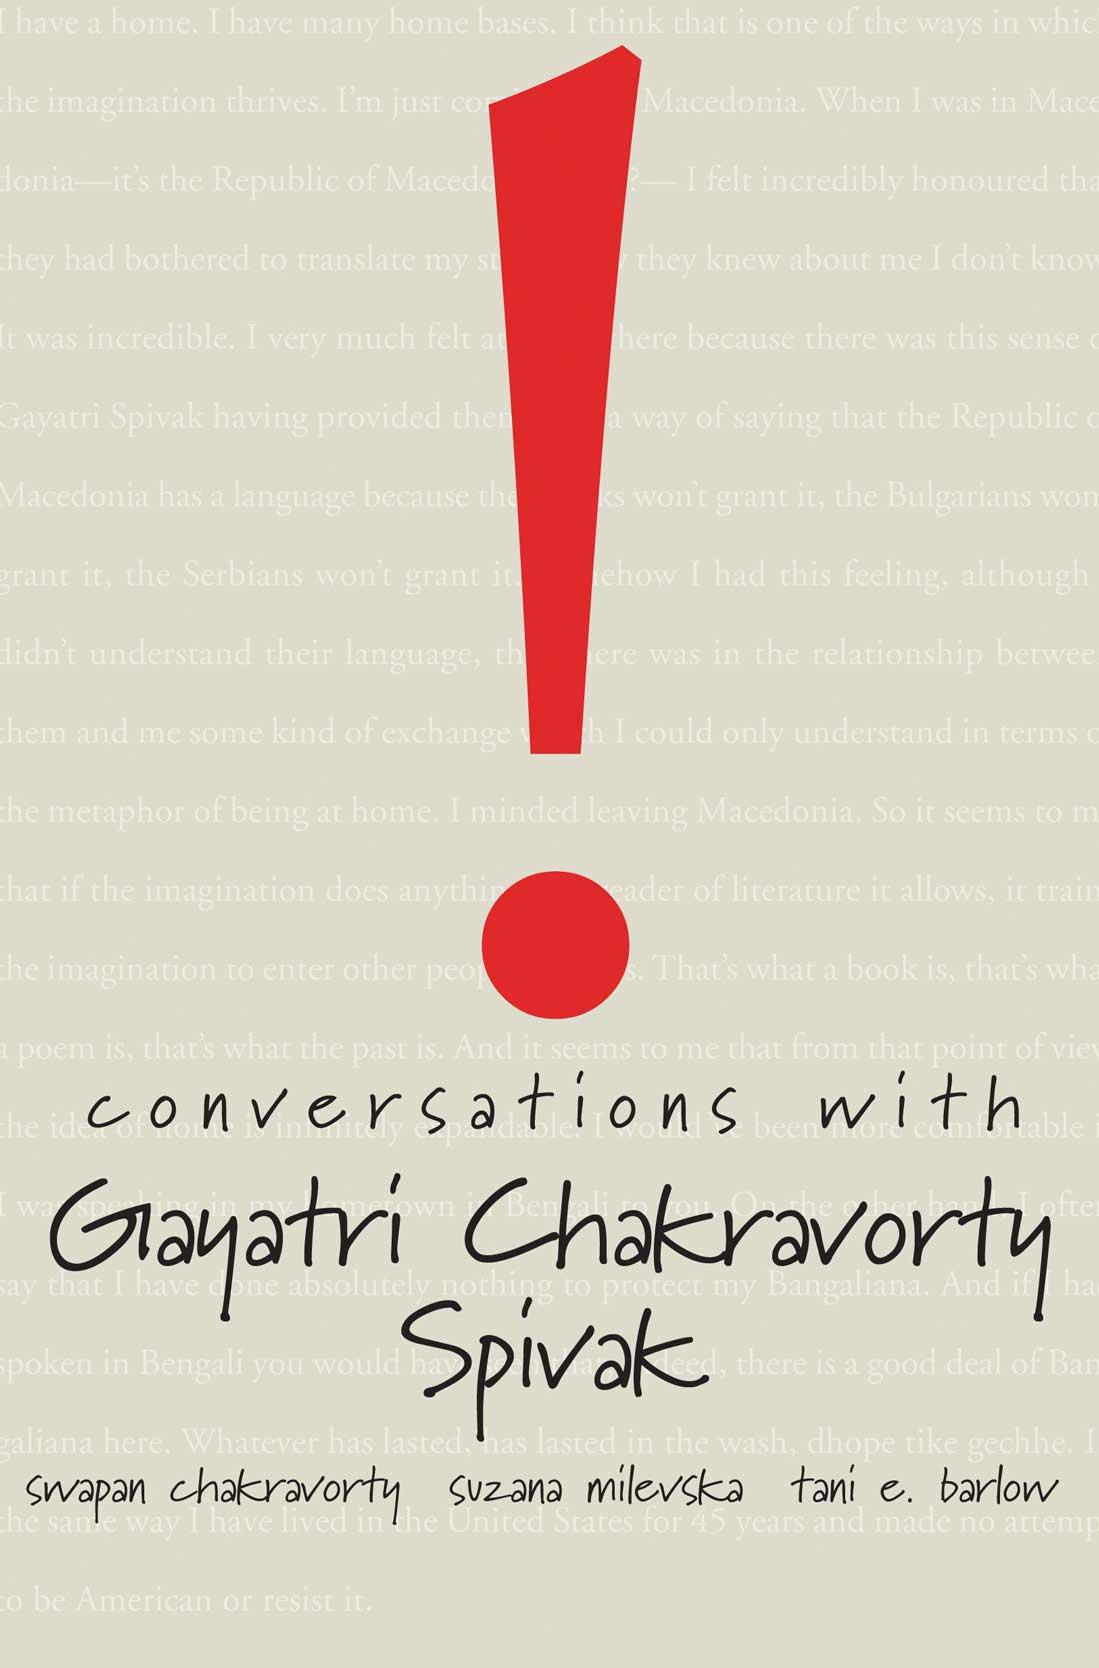 Conversations with Gayatri Chakravorty Spivak by Gayatri Chakravorty Spivak | Seagull Books